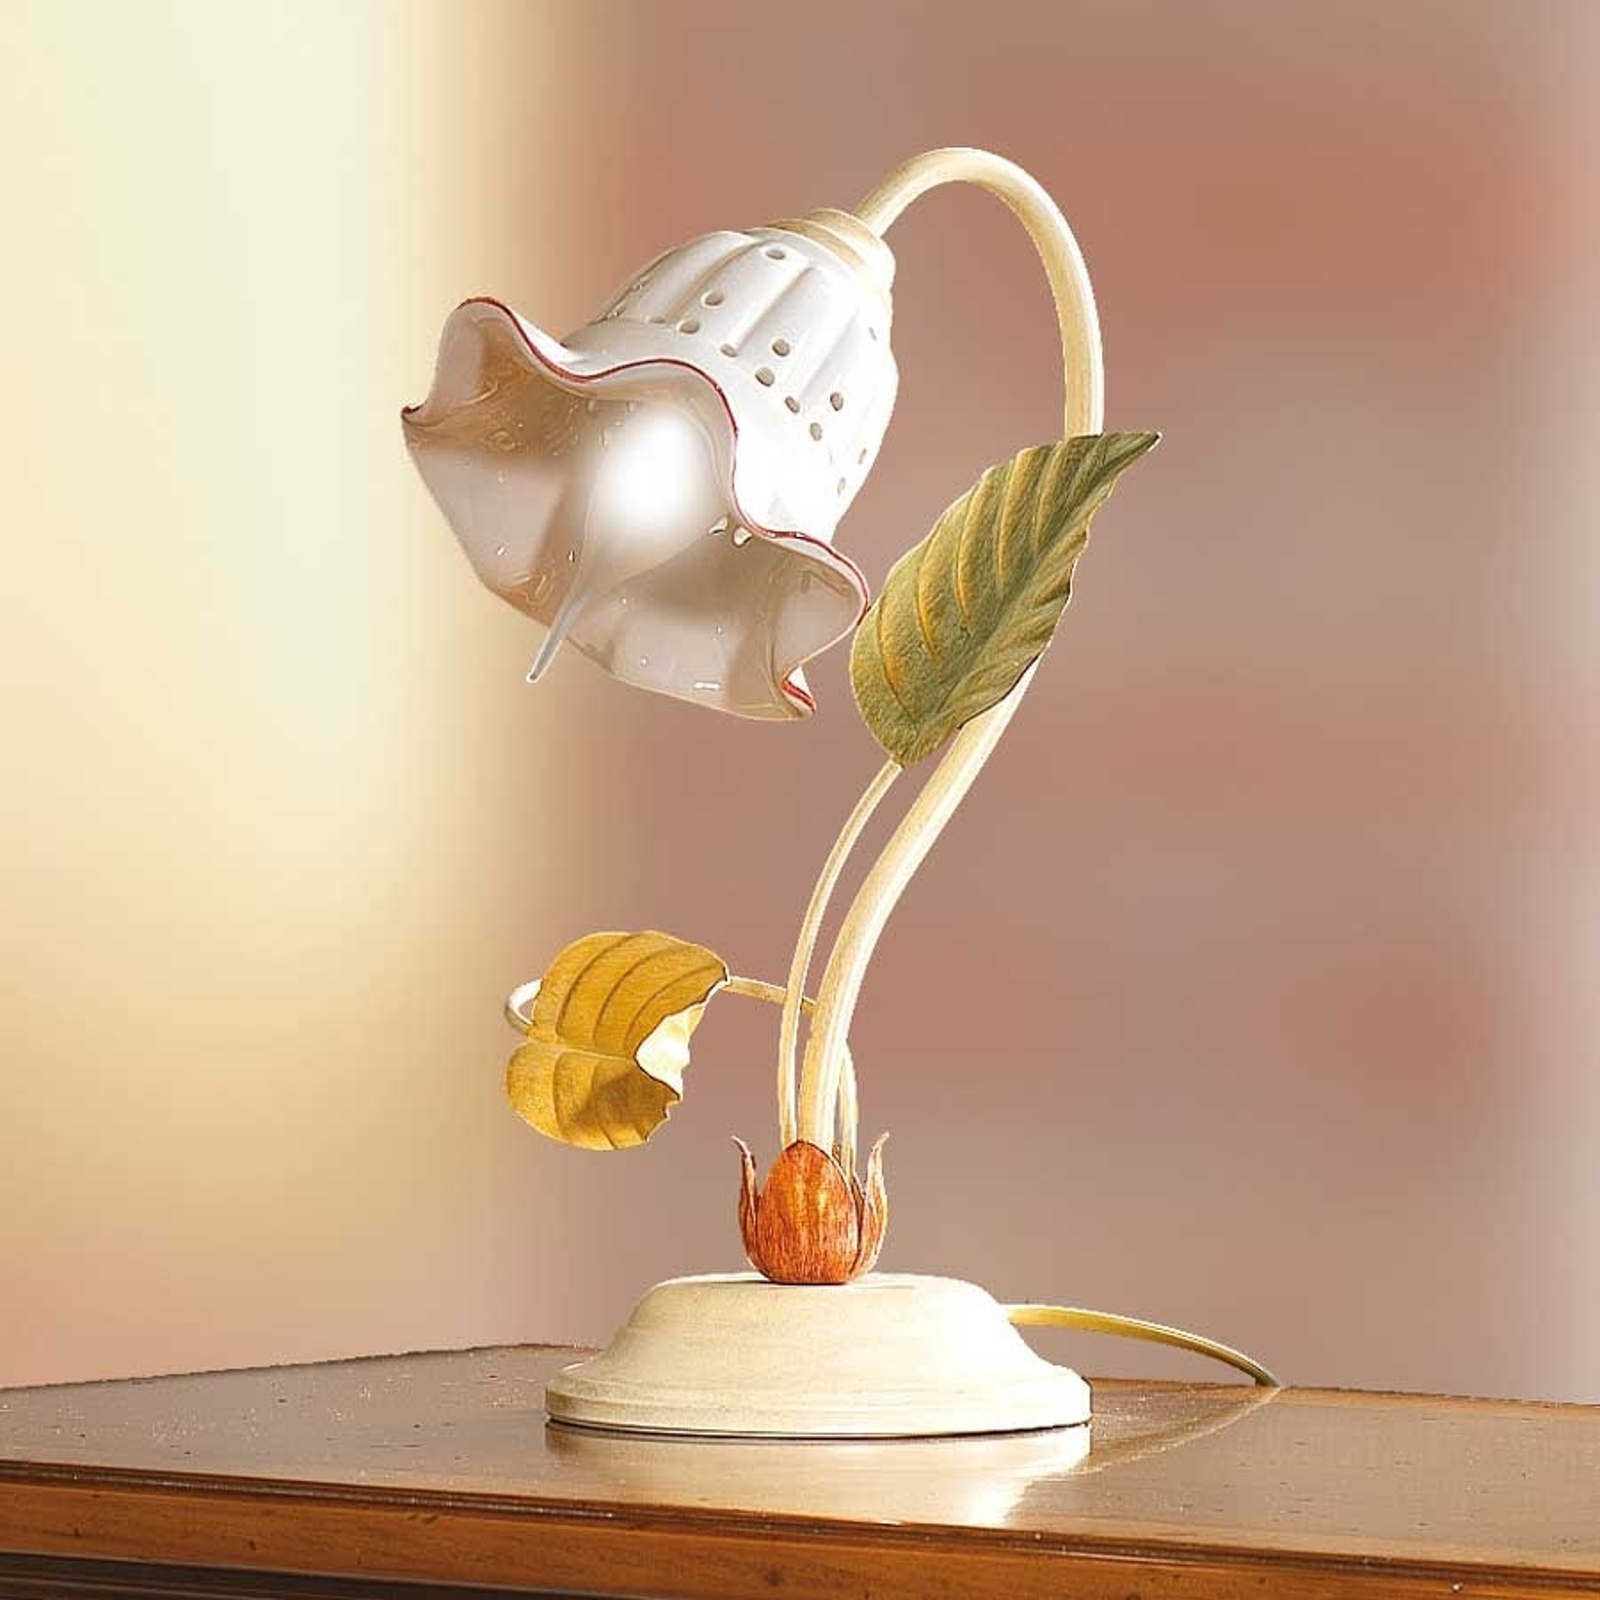 Tafellamp GIADE in Florentijnse stijl